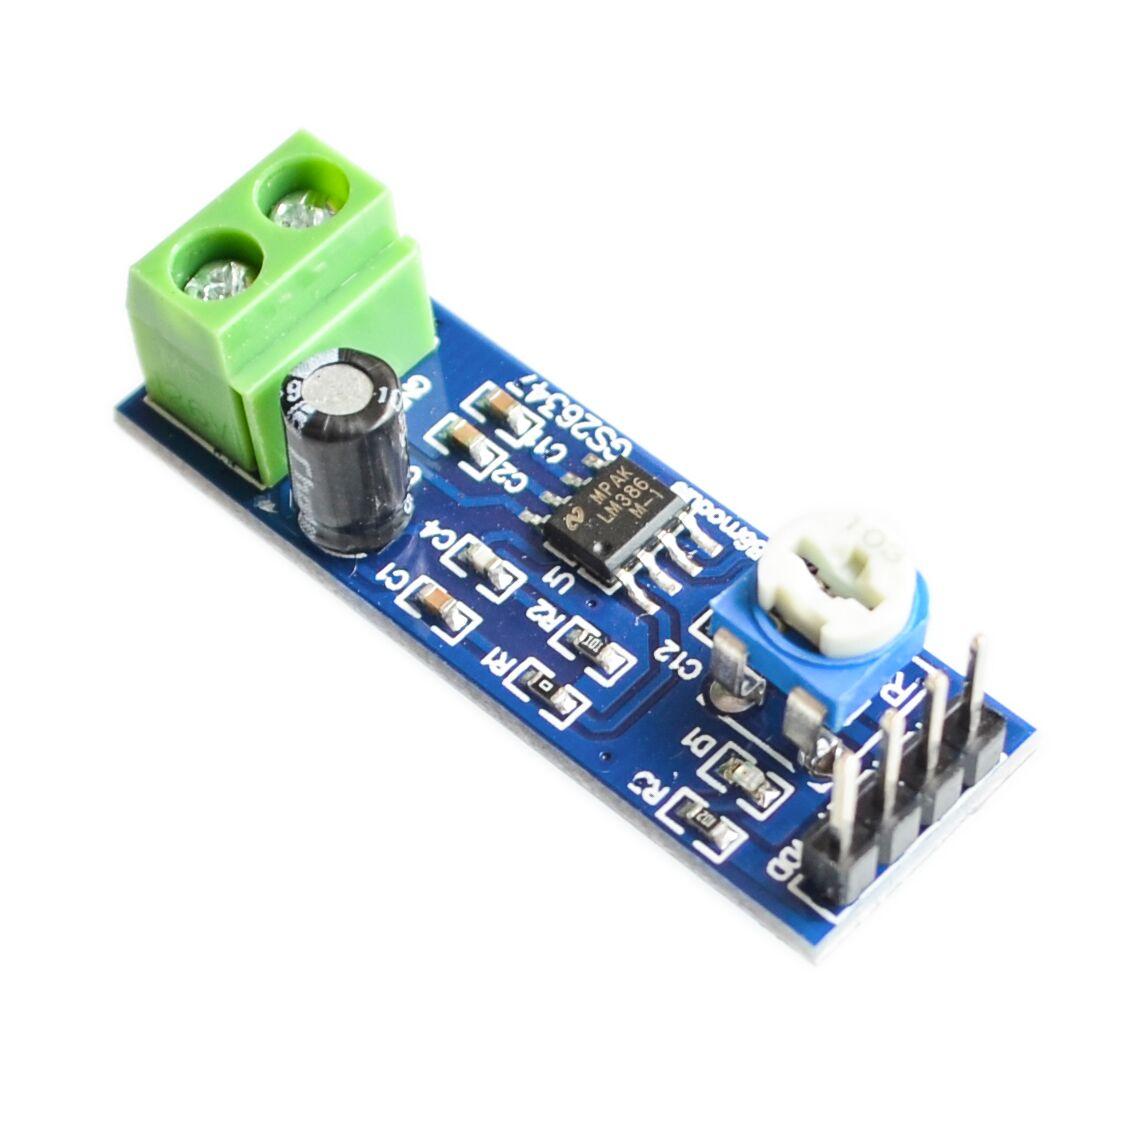 10pcs/lot LM386 Audio Amplifier Module 200 Times 5V-12V Input 10K Adjustable Resistance Dropshipping